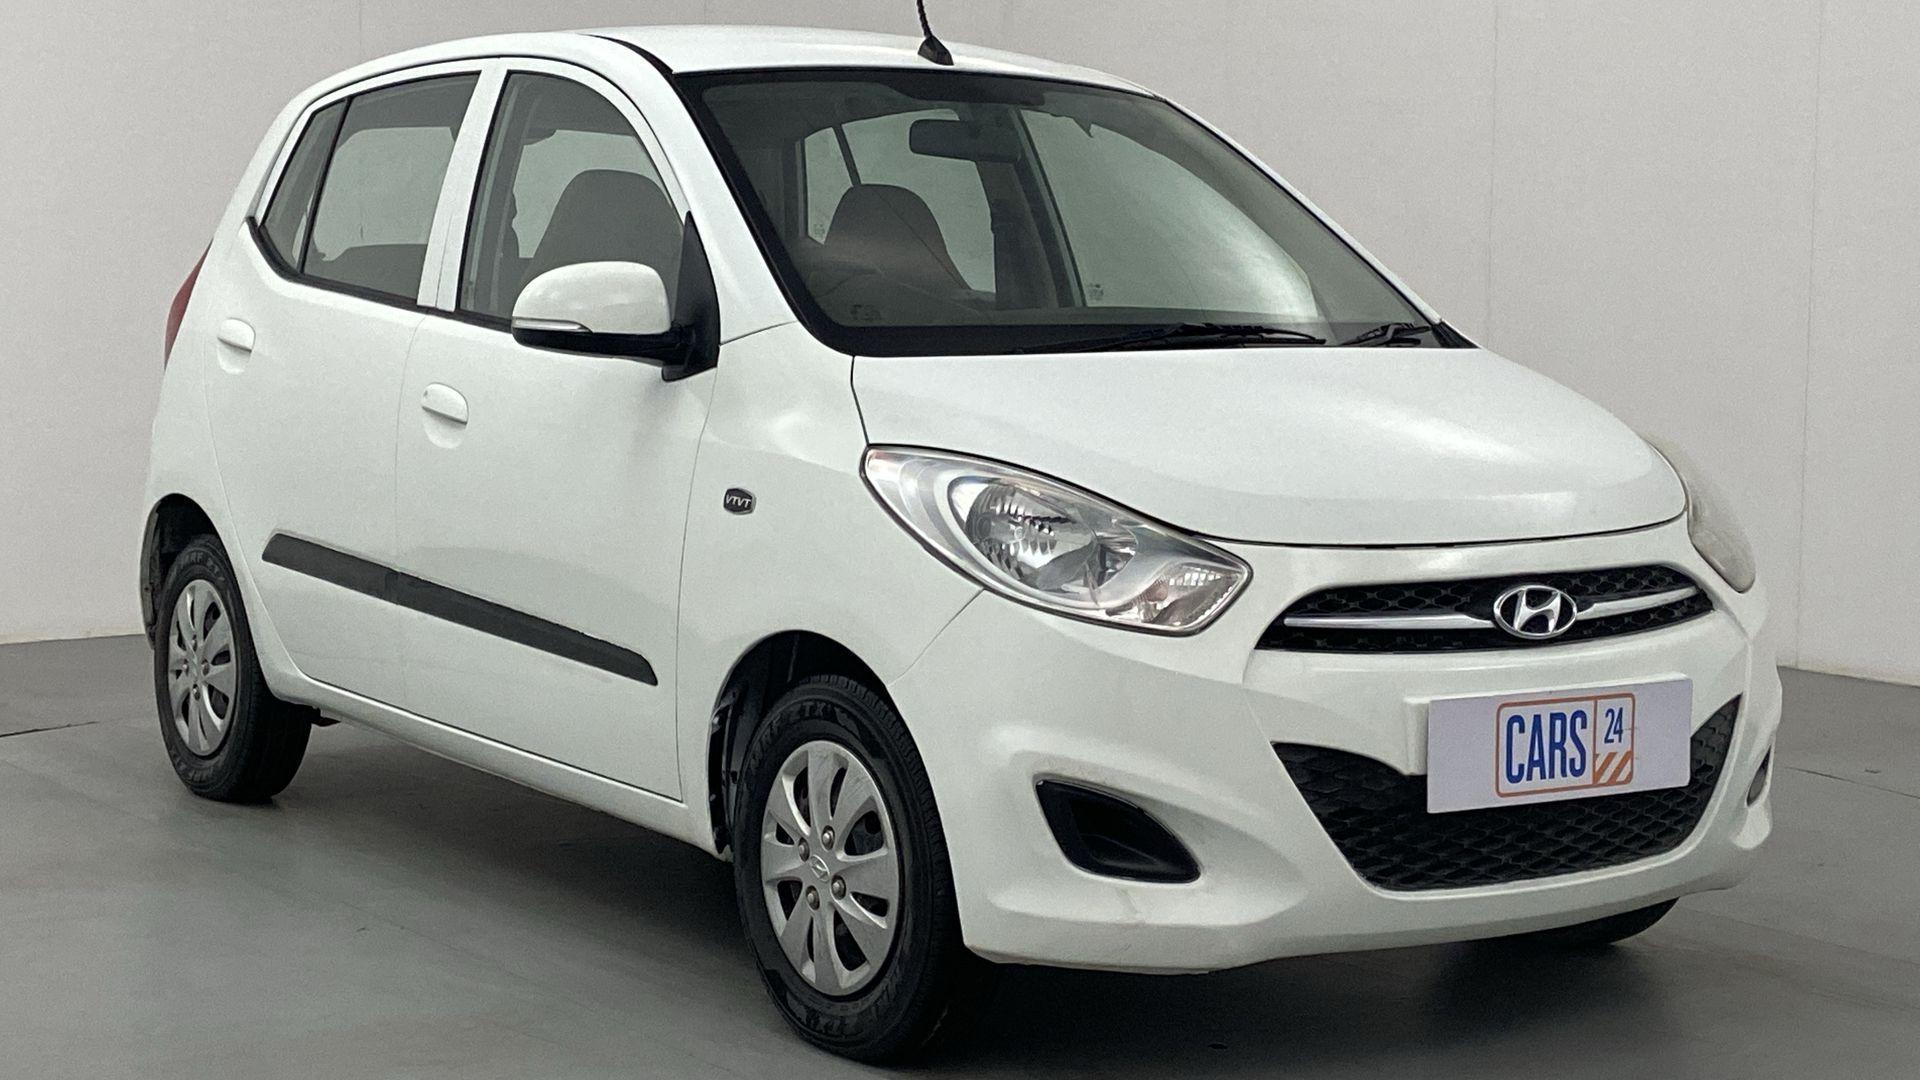 2013 Hyundai i10 MAGNA 1.2 KAPPA2